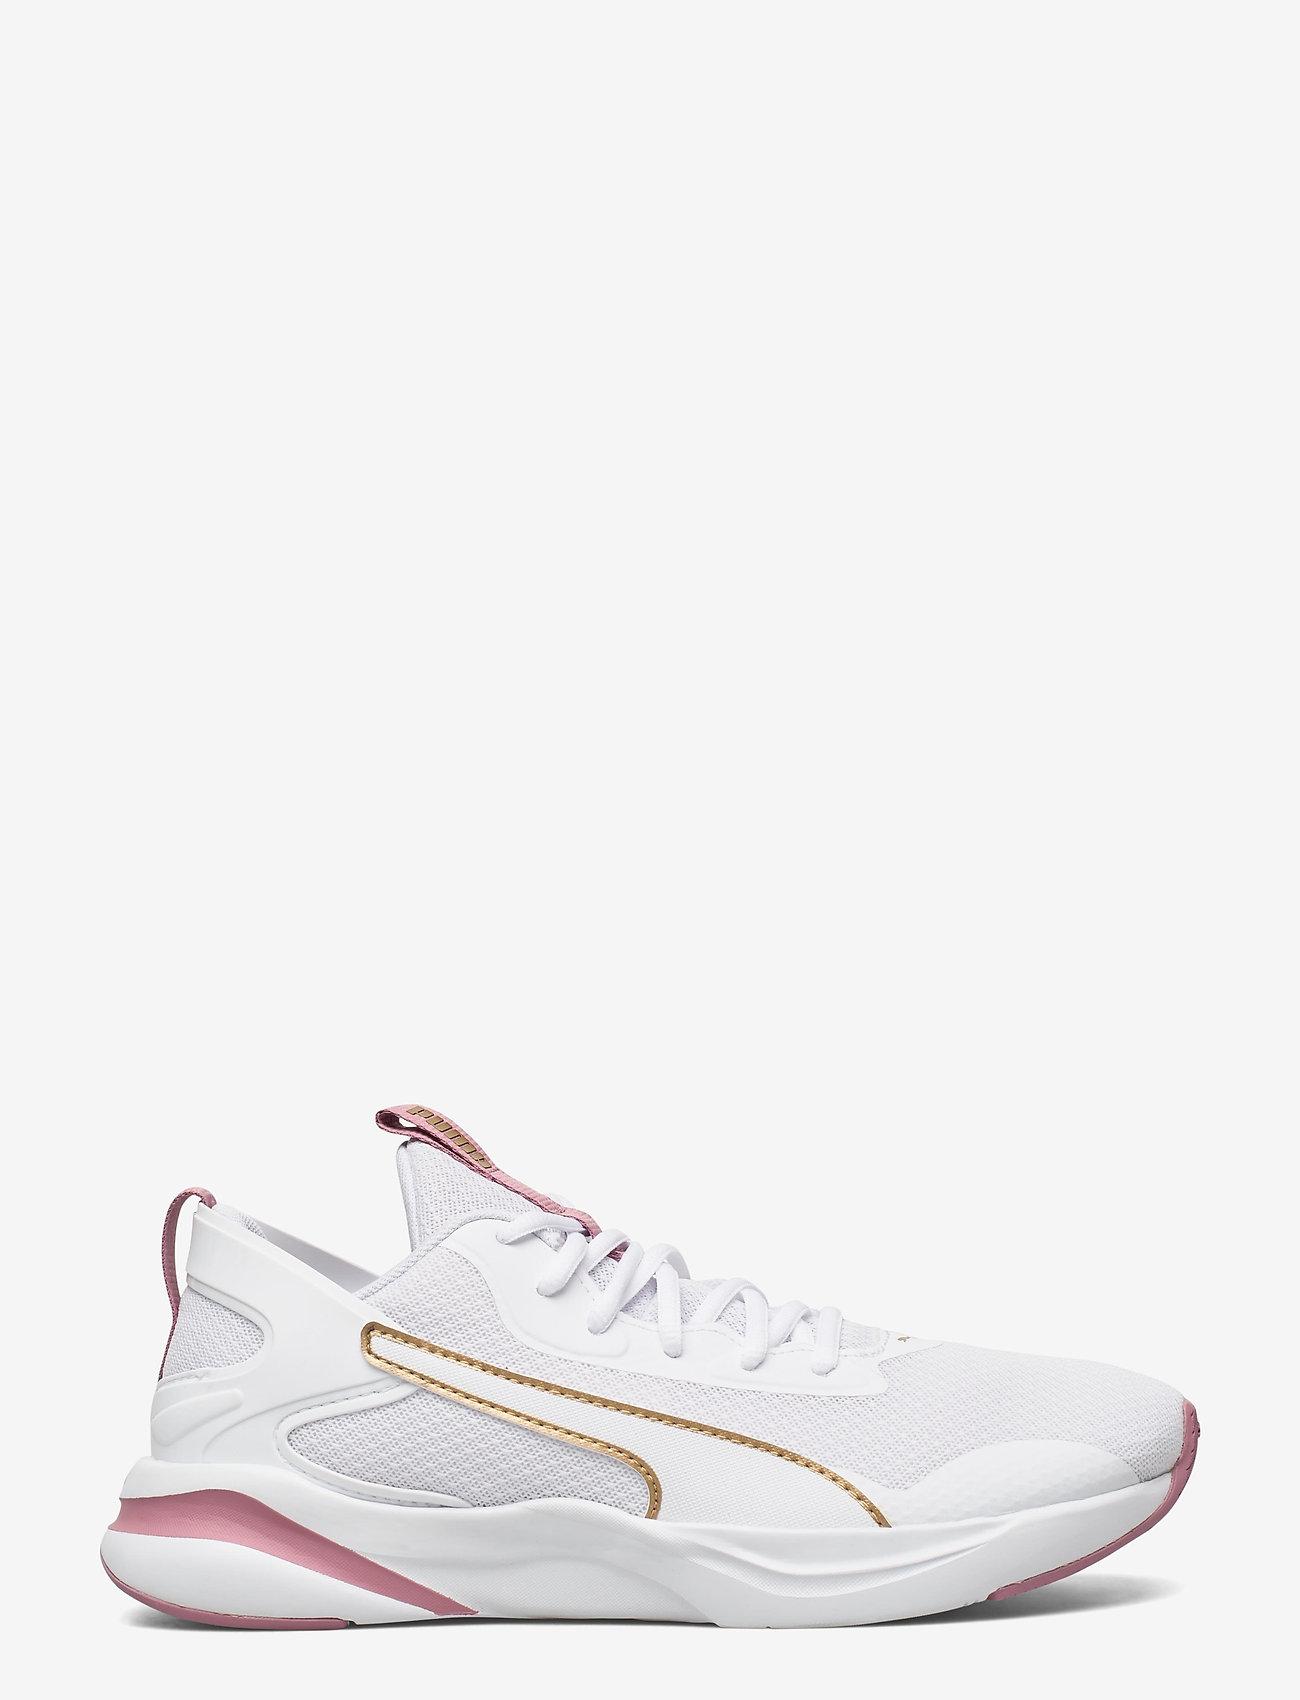 PUMA - SOFTRIDE RIFT Wn's - lage sneakers - puma white-foxglove - 1